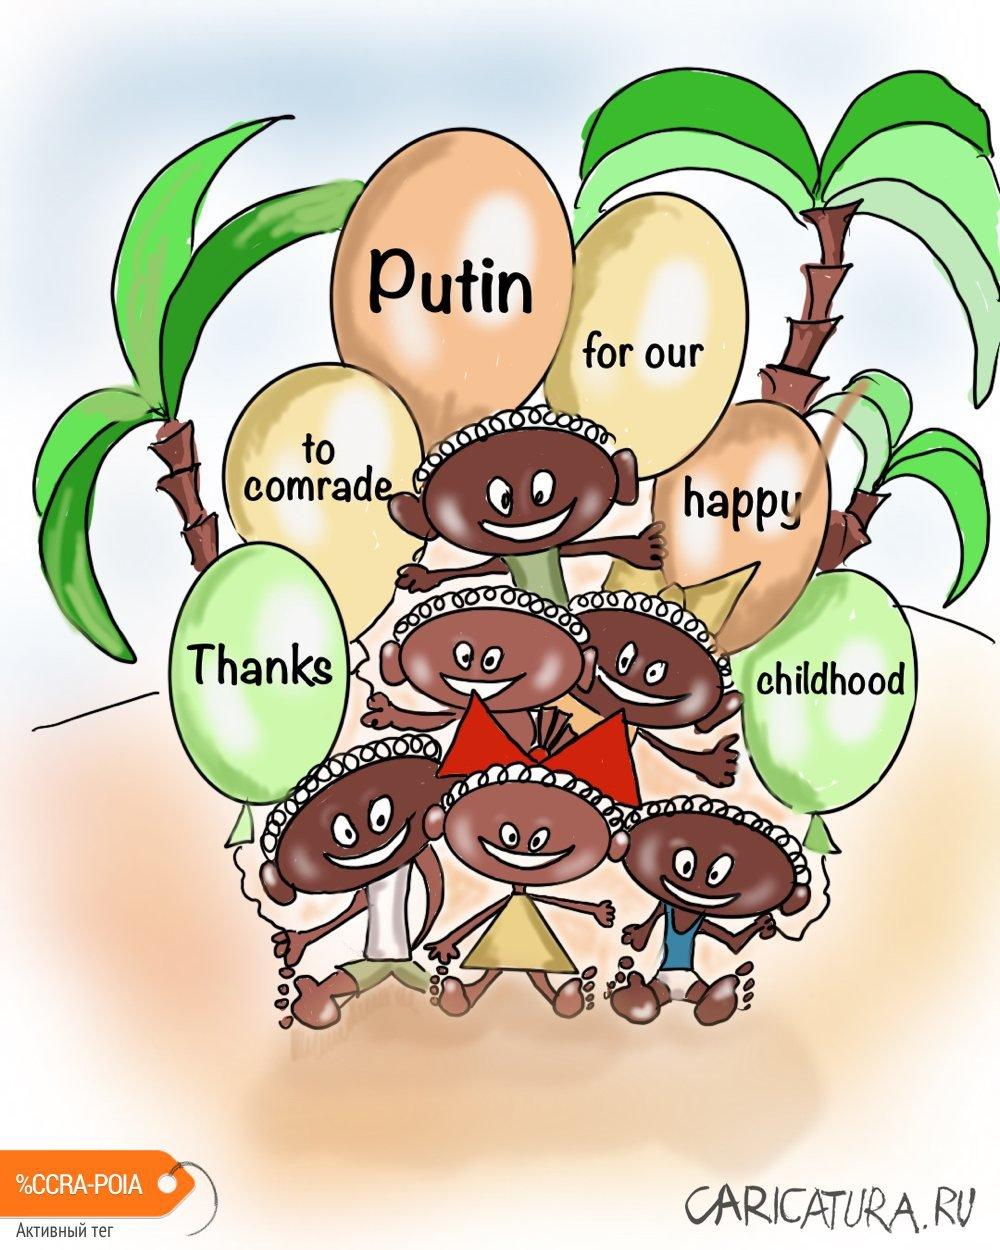 Спасибо за счастливое детство, Алексей Корякин